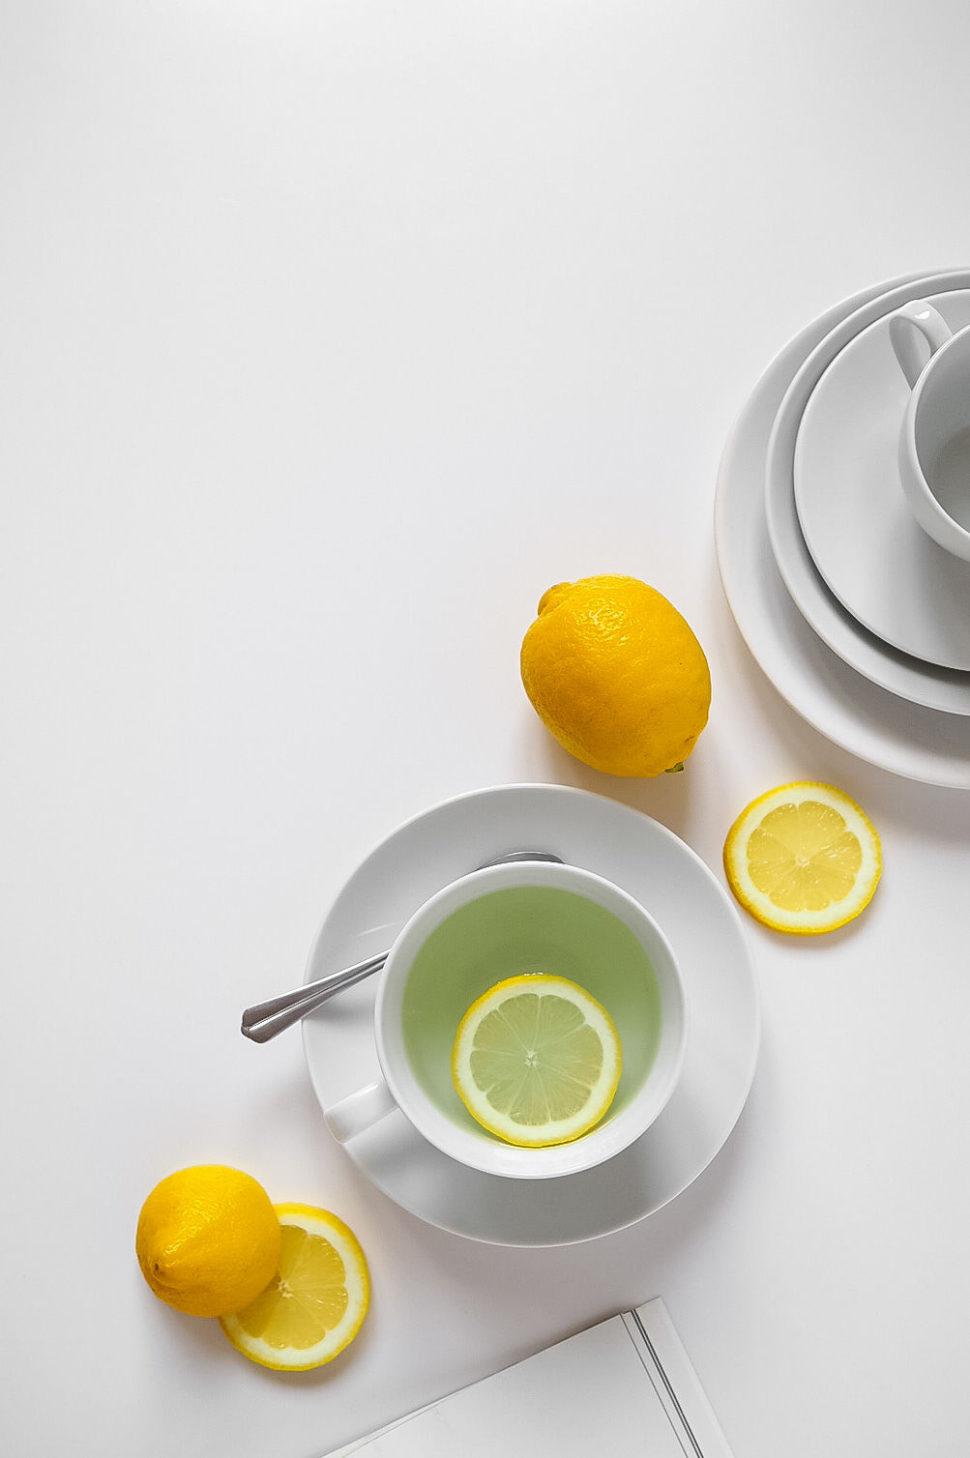 Minimal flatlay with lemons